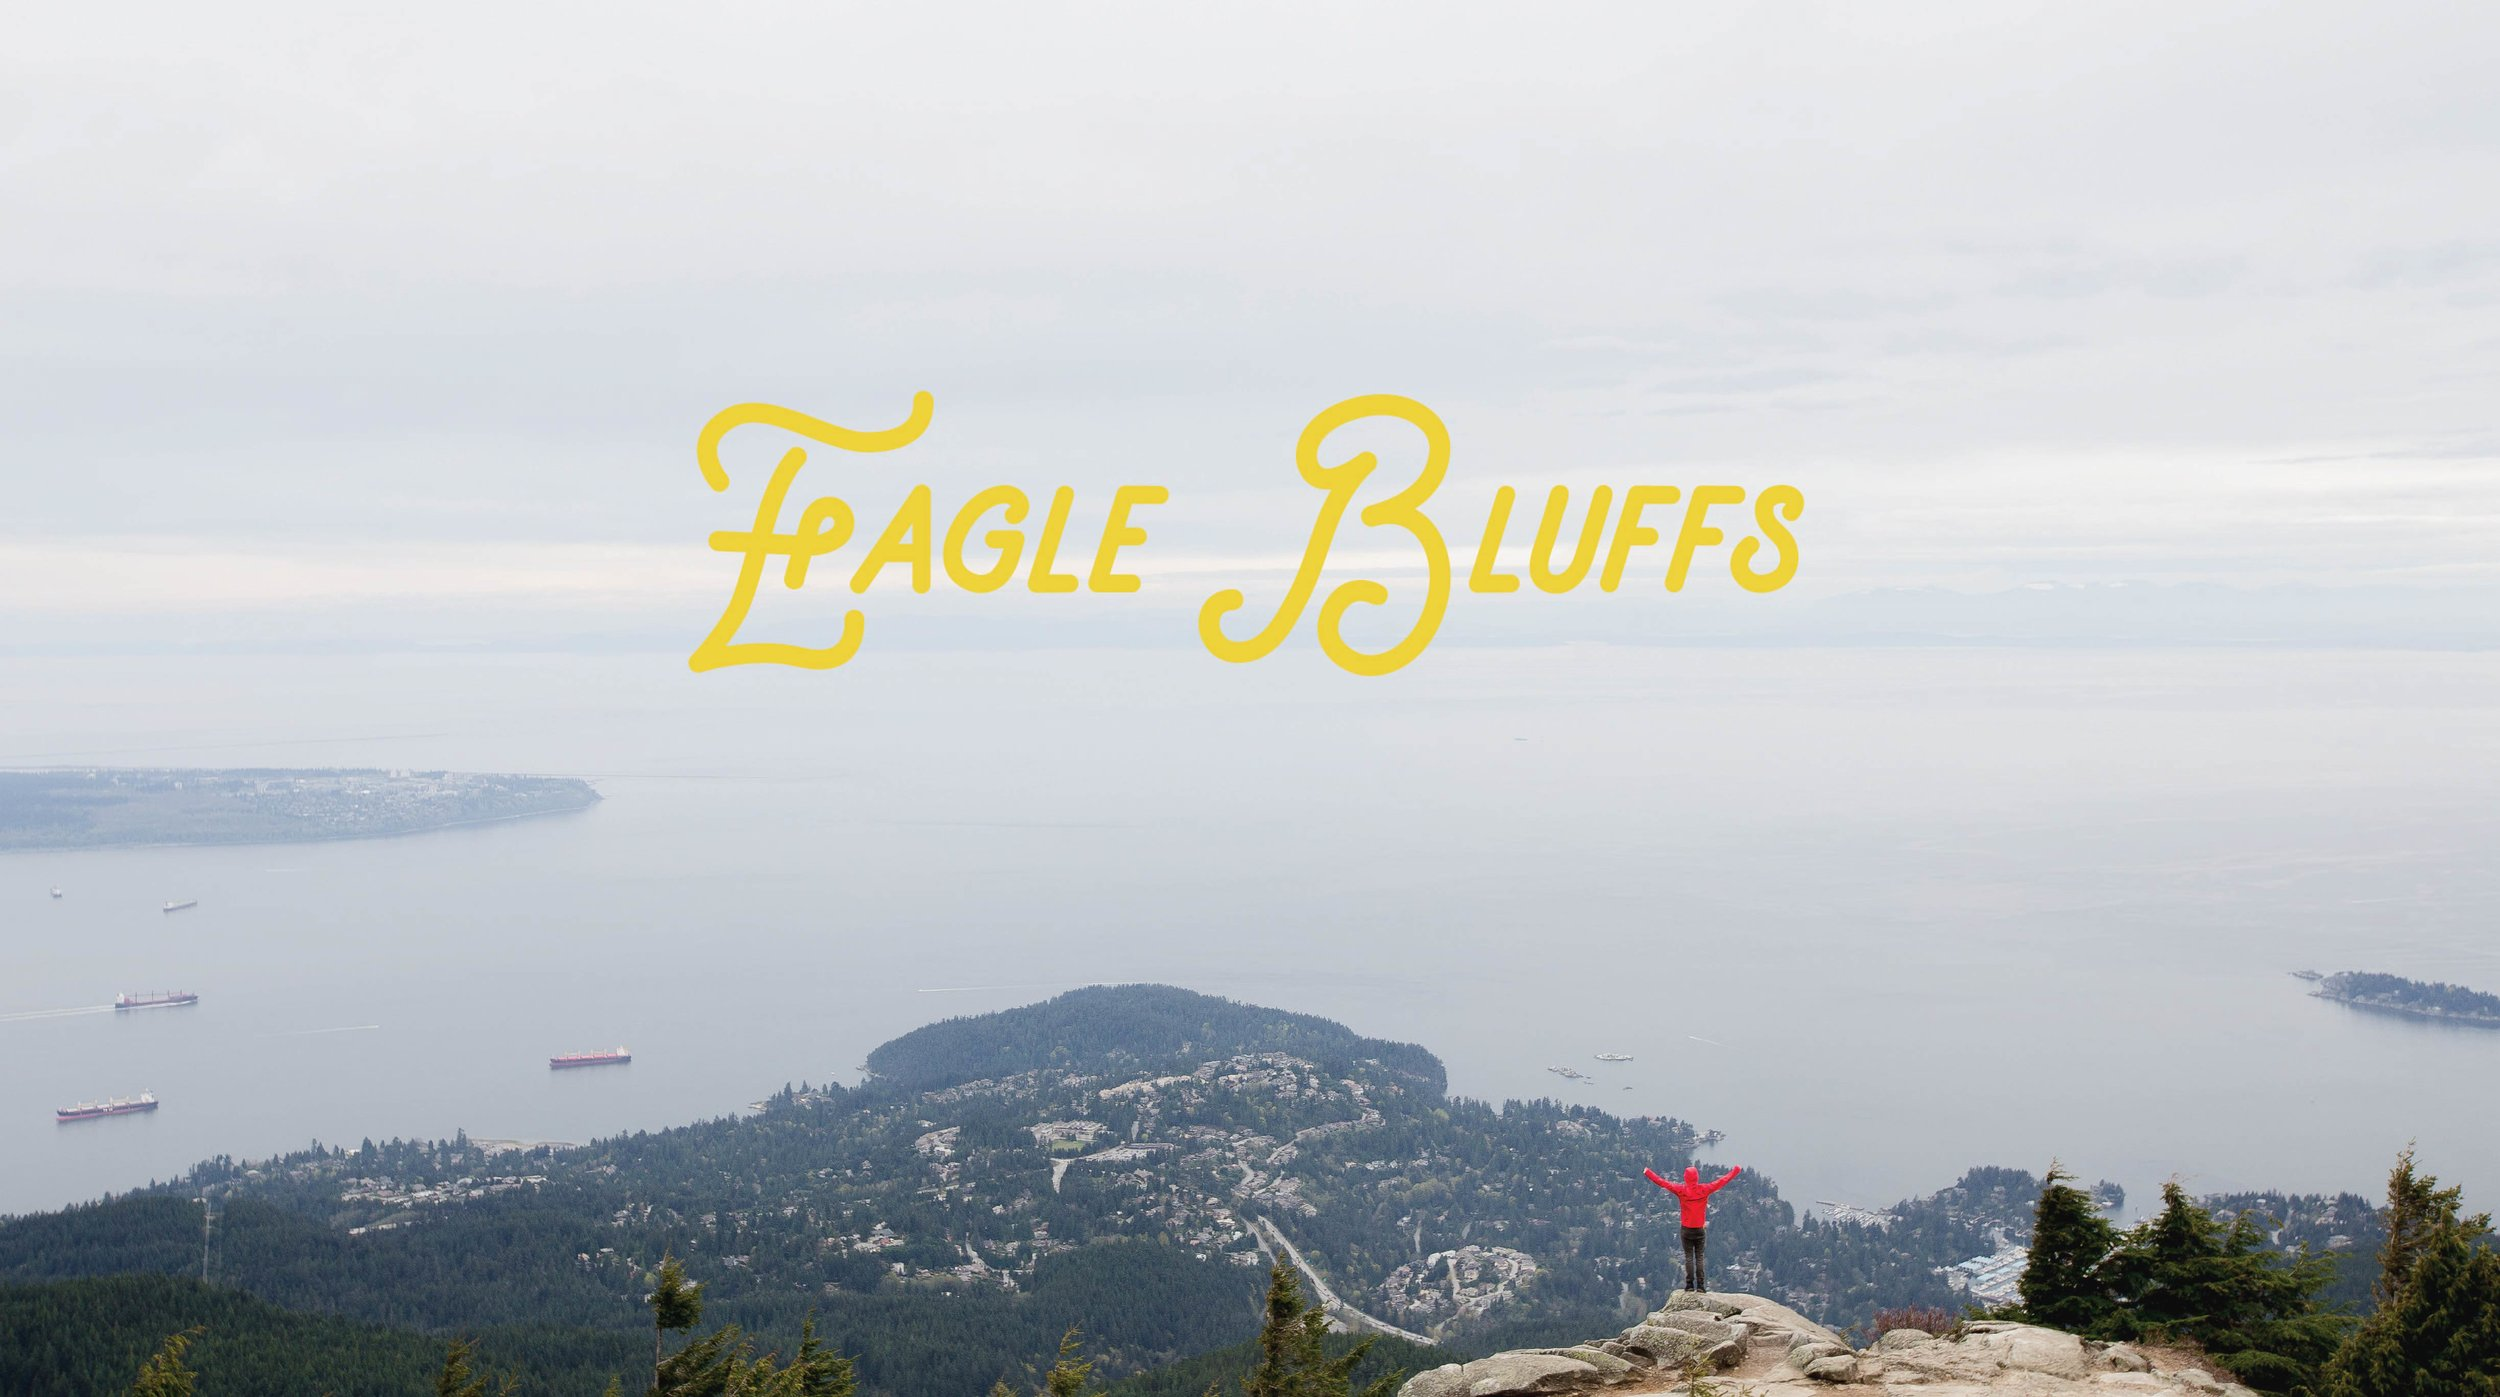 Eagle Bluffs - VancityWild